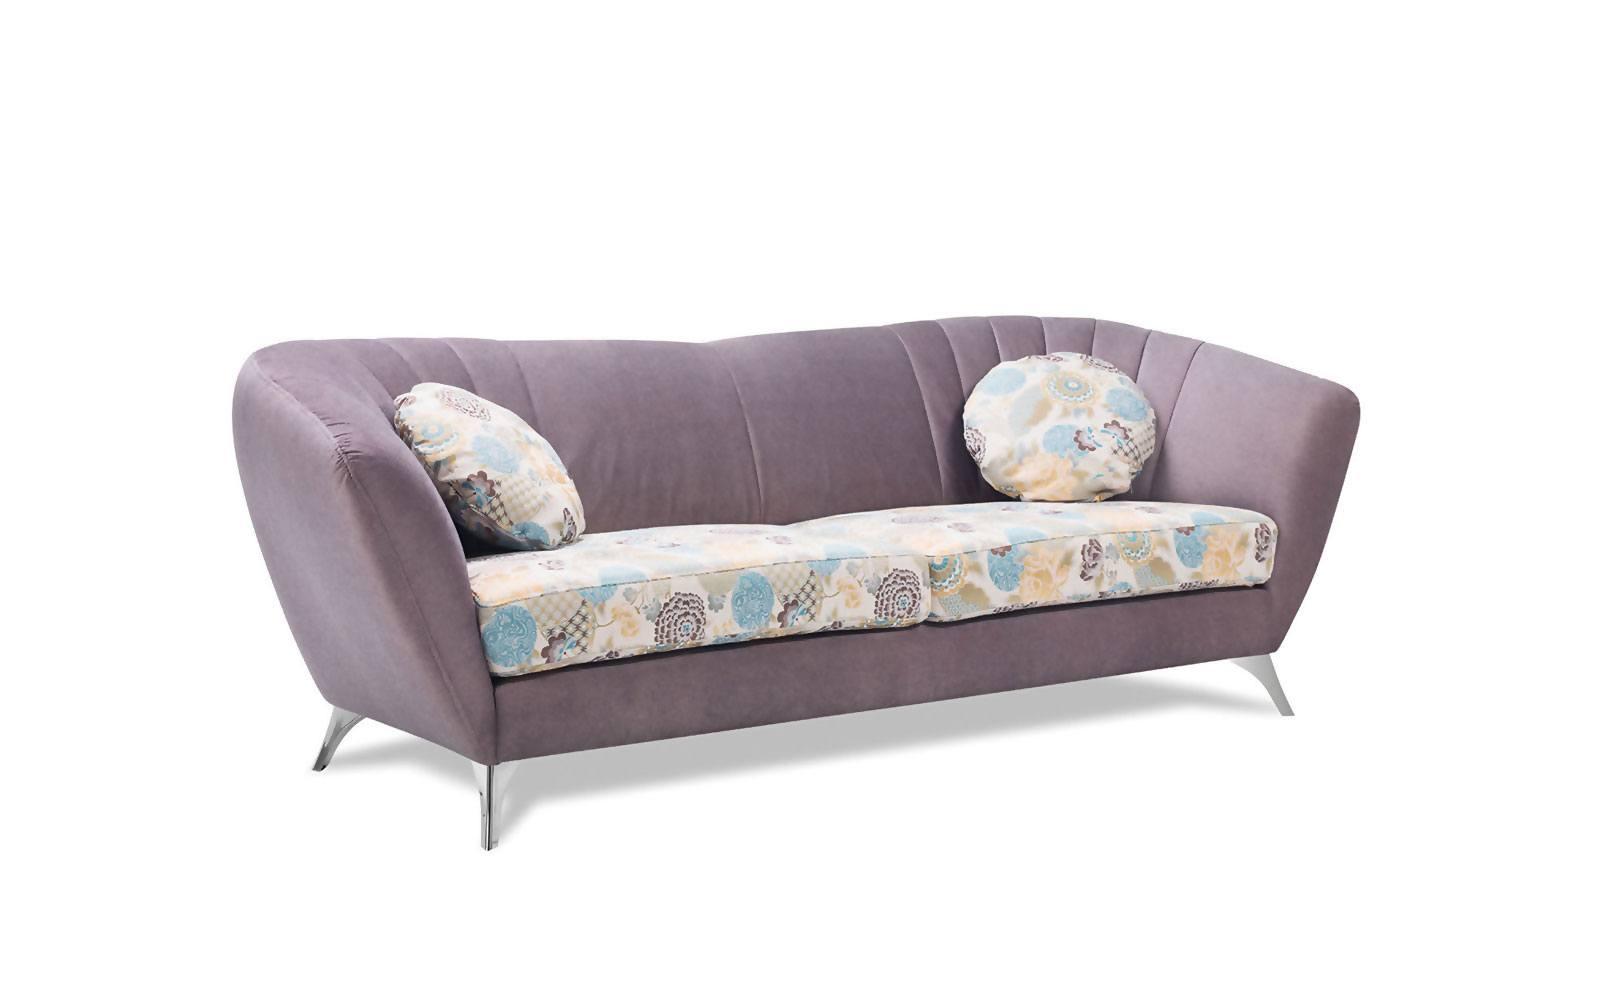 Canapea fixa 3 locuri Vittorio, l240xA90xH85 cm